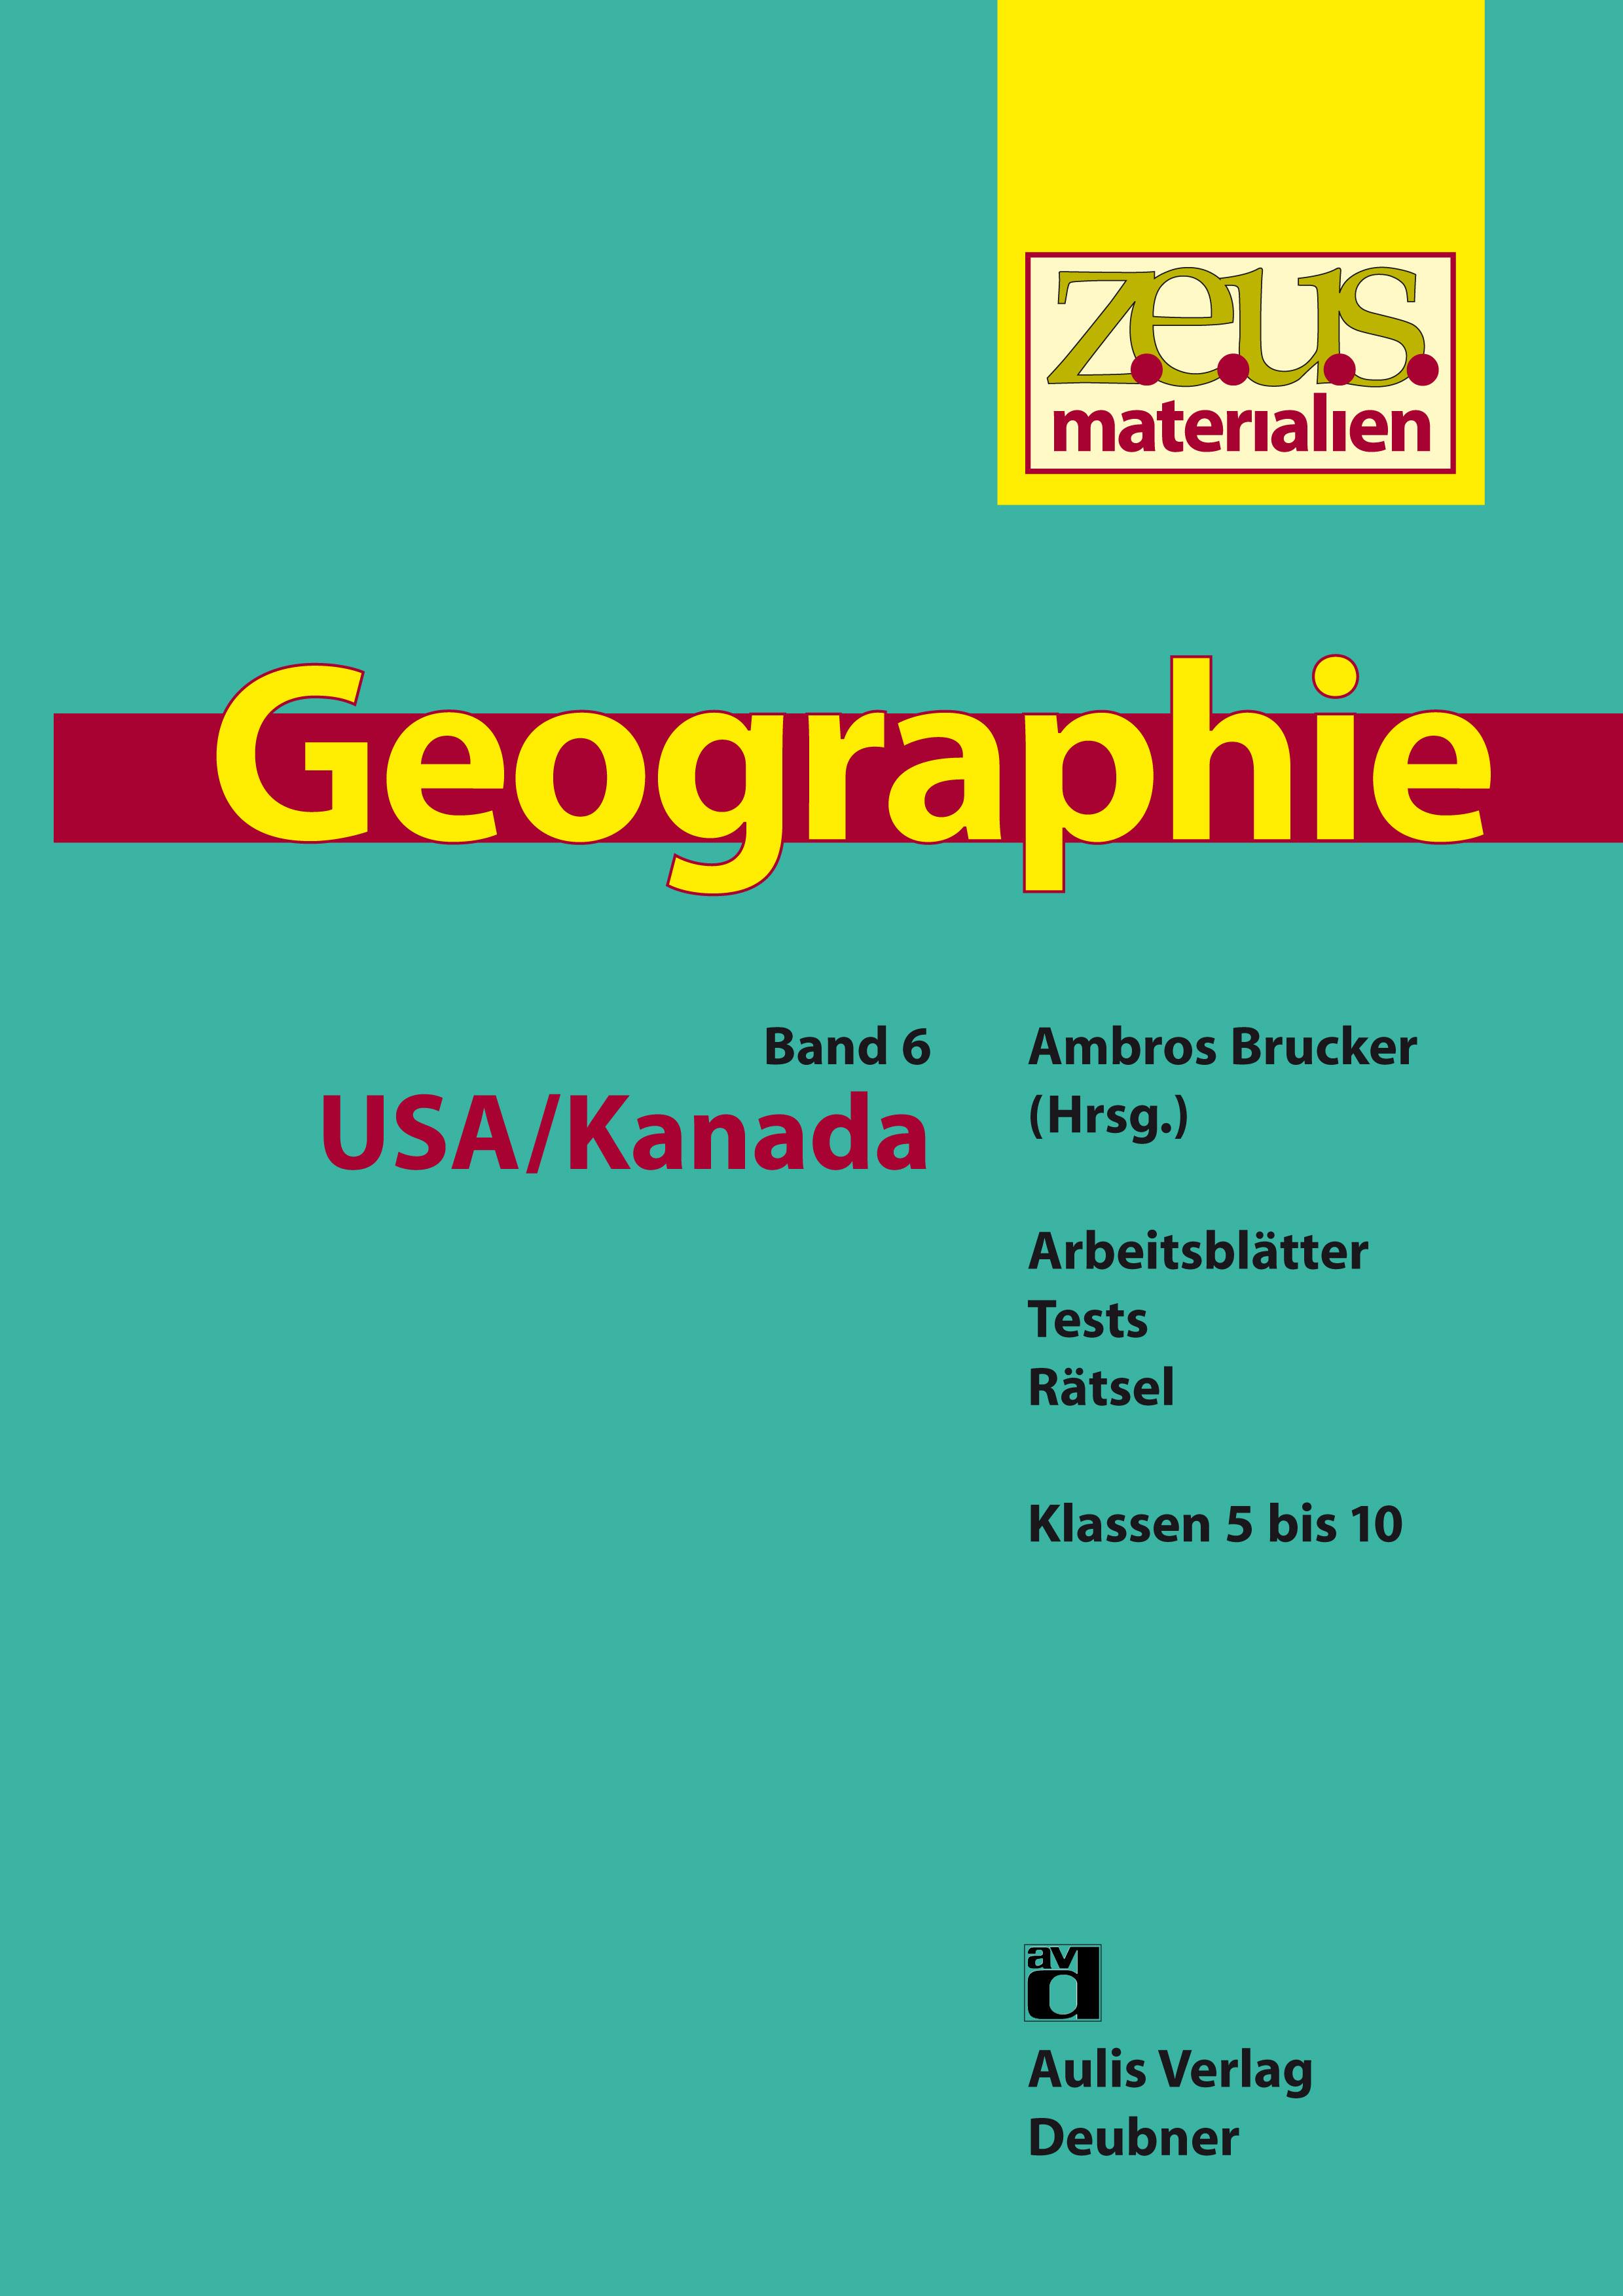 z.e.u.s. Materialien Geographie-Buchreihe – Band 6: USA / Kanada